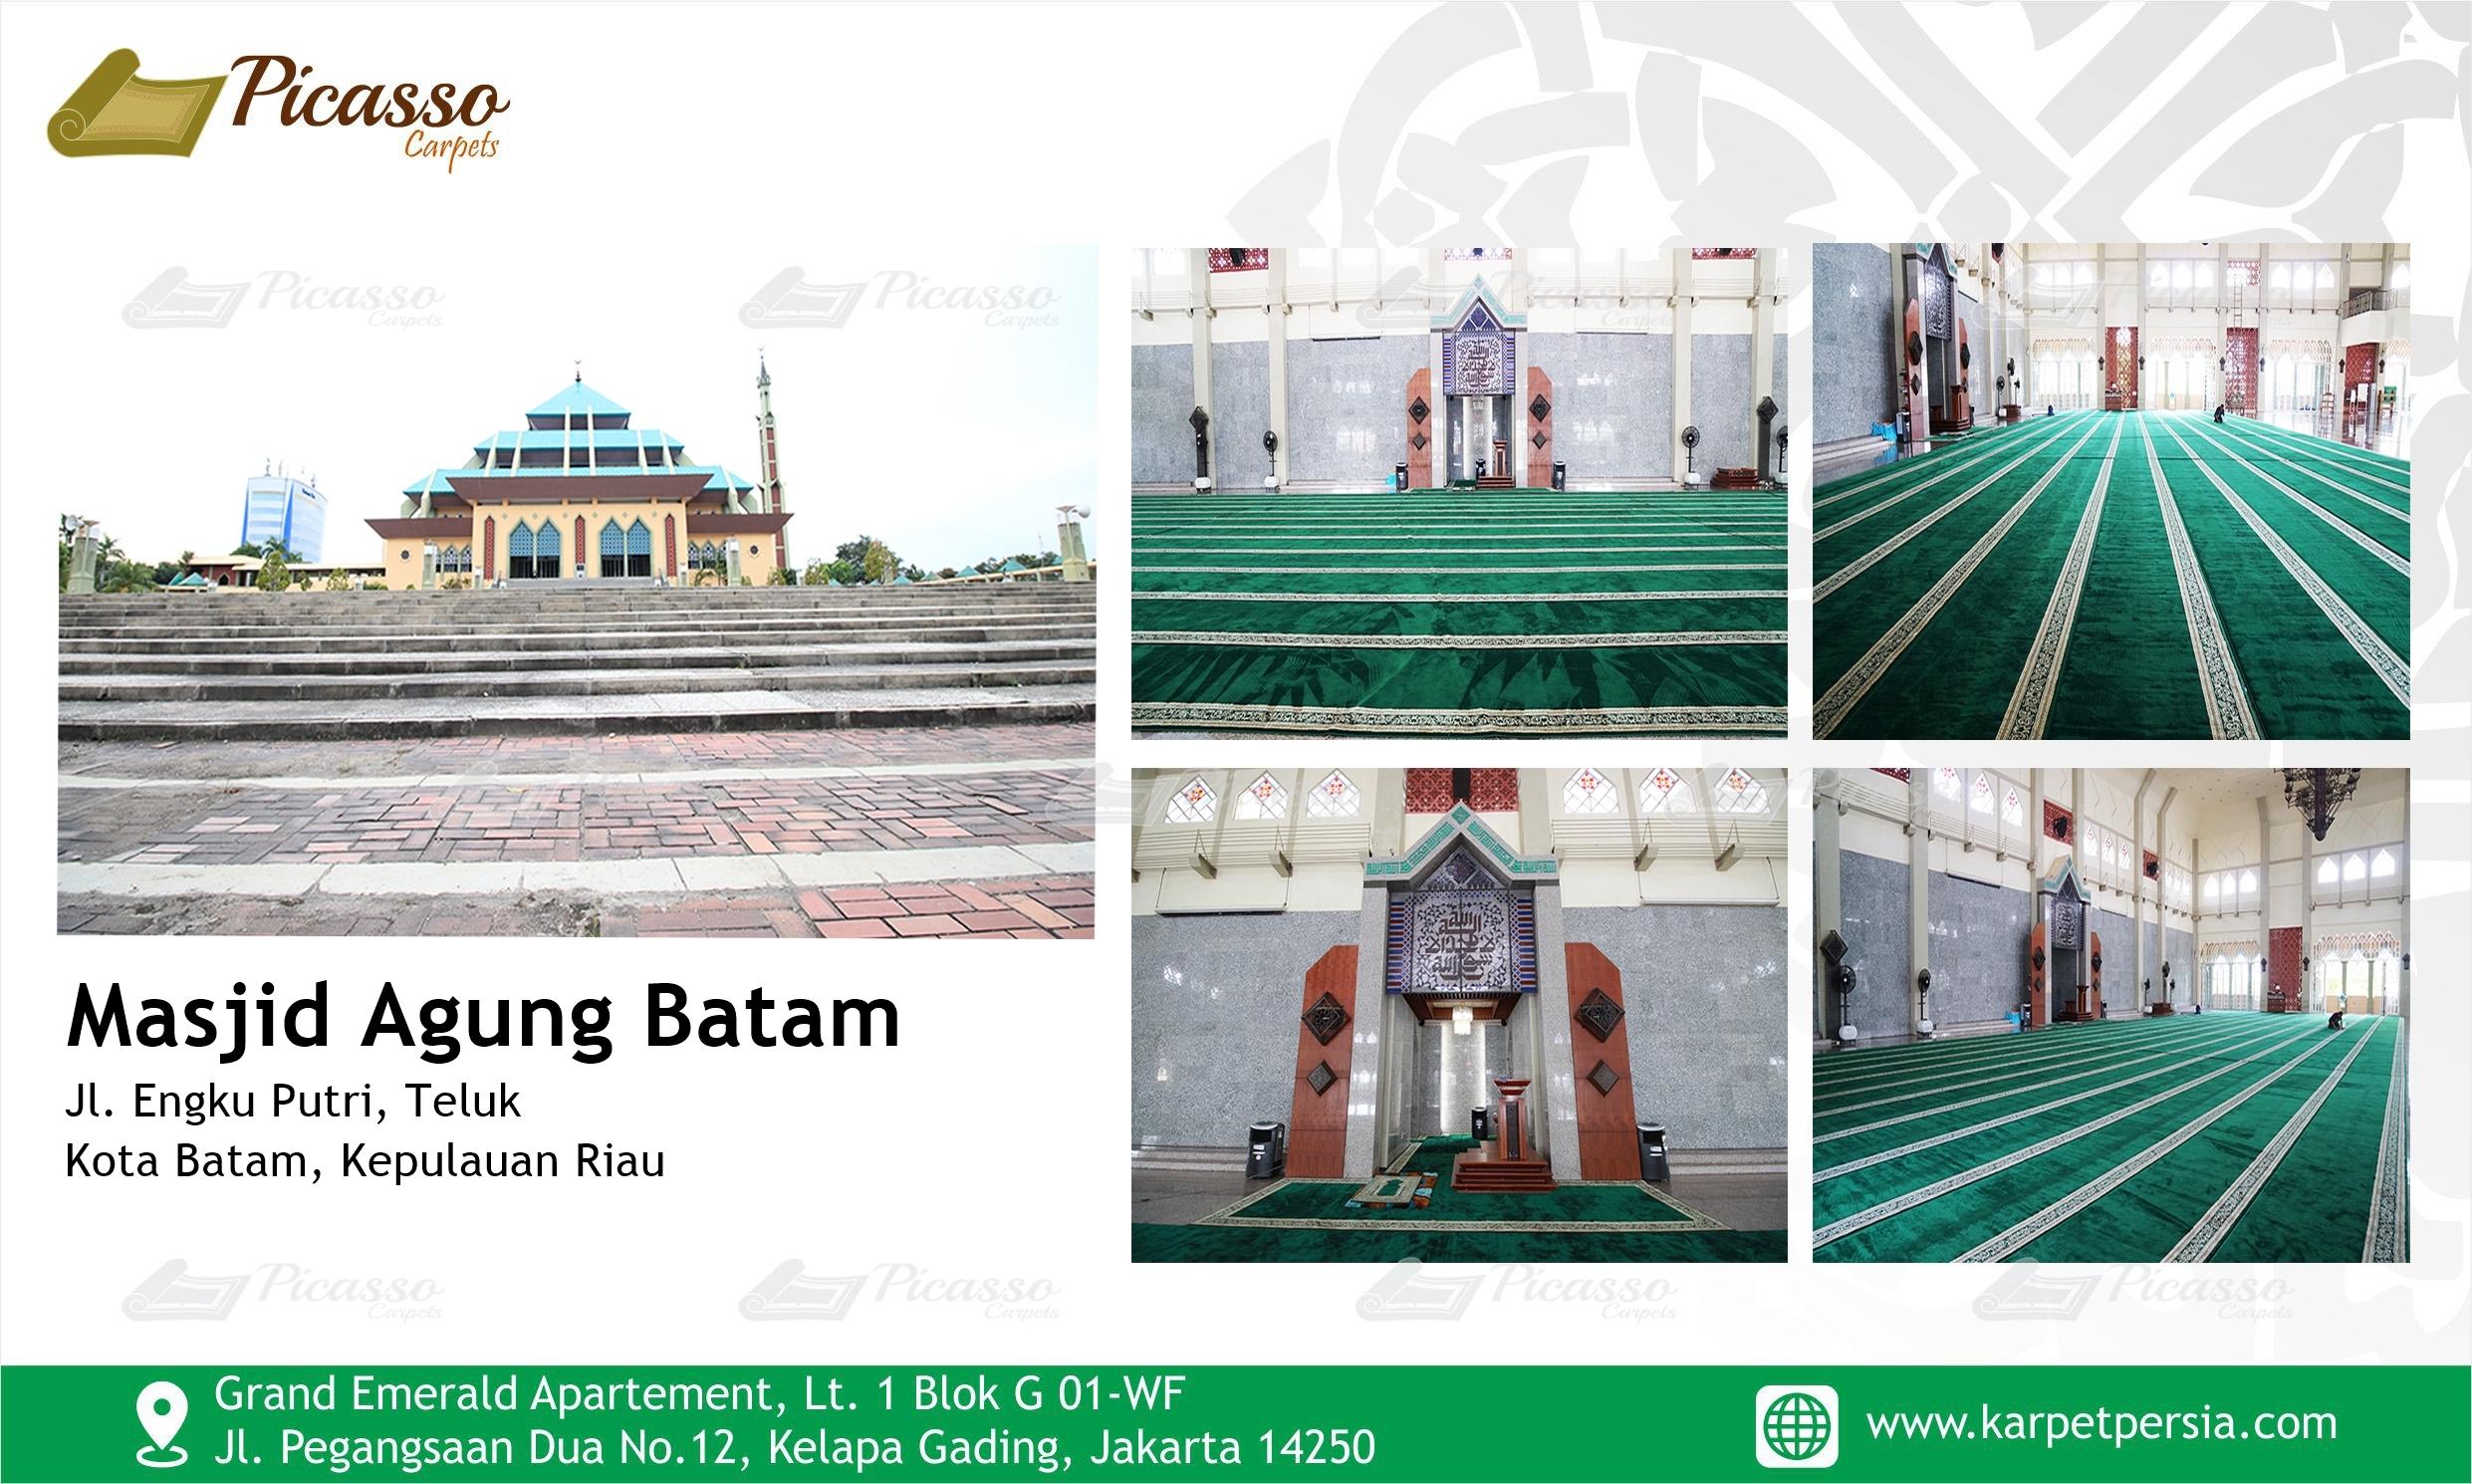 Masjid Agung Batam, Kepulauan Riau